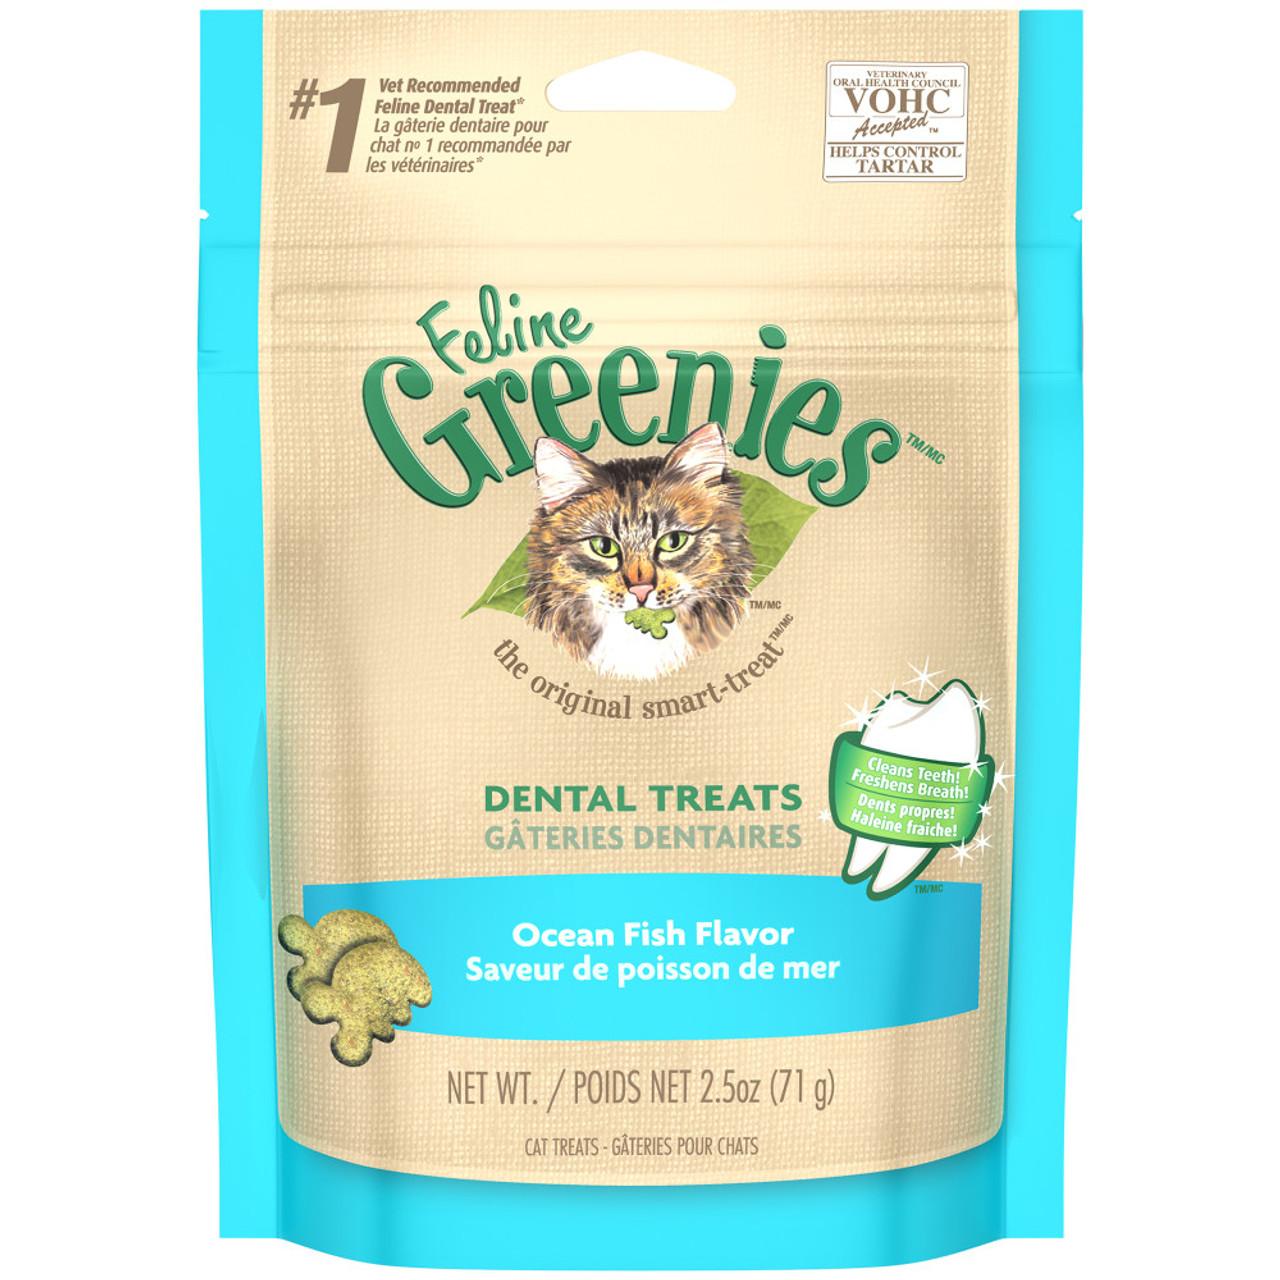 Greenies Ocean Fish Flavor Dental Cat Treats